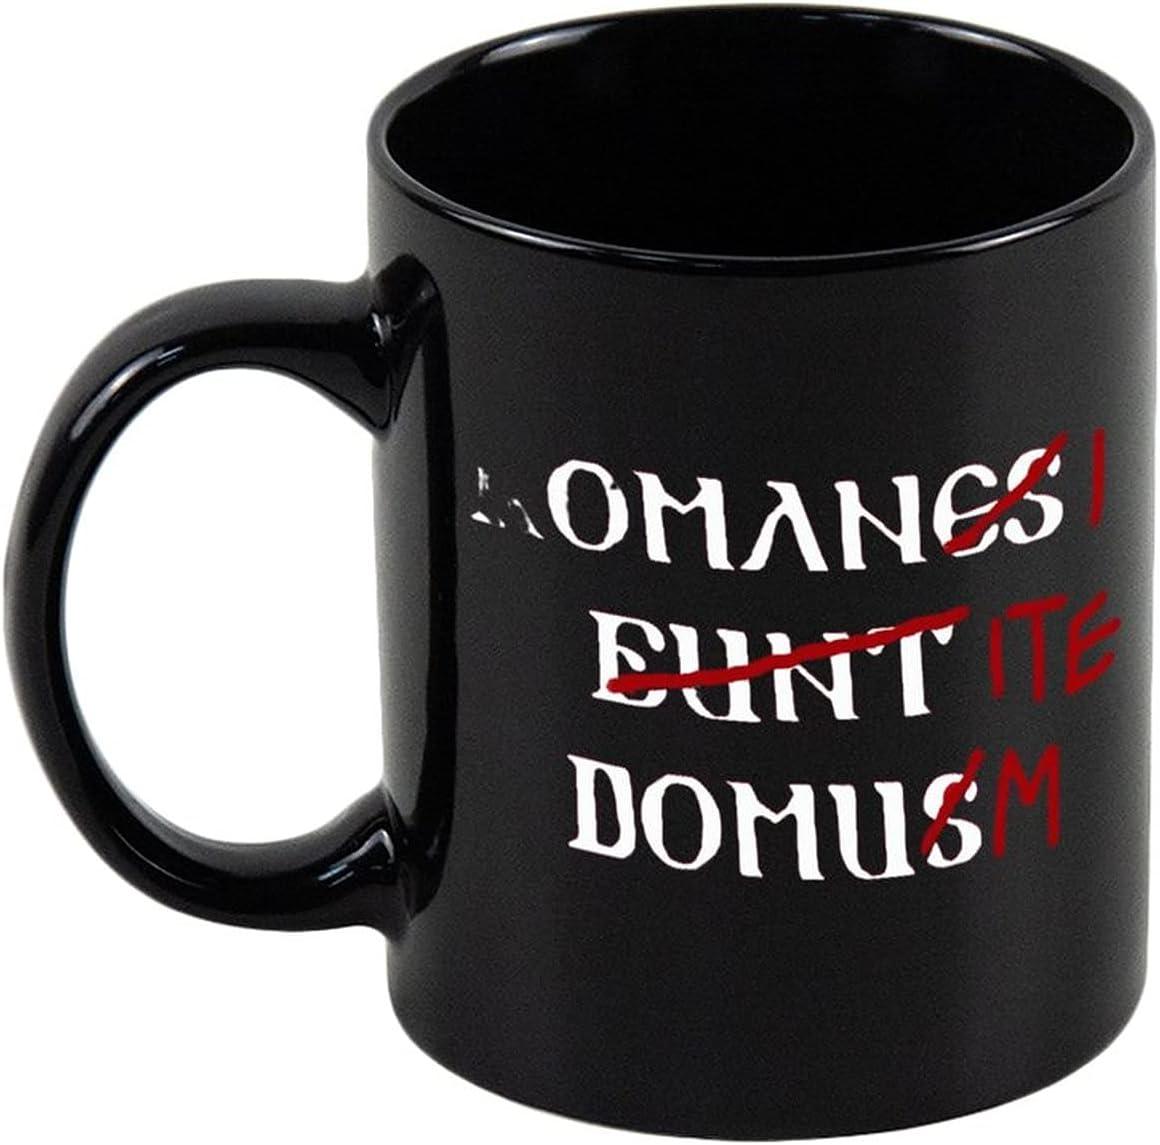 Romans Go Home 11oz Black Ceramic Coffee Mug Tea Mug For Your Mom, Dad, Men Or Women Mug Cup, For Birthday Christmas Anniversary, Holiday Or Graduation